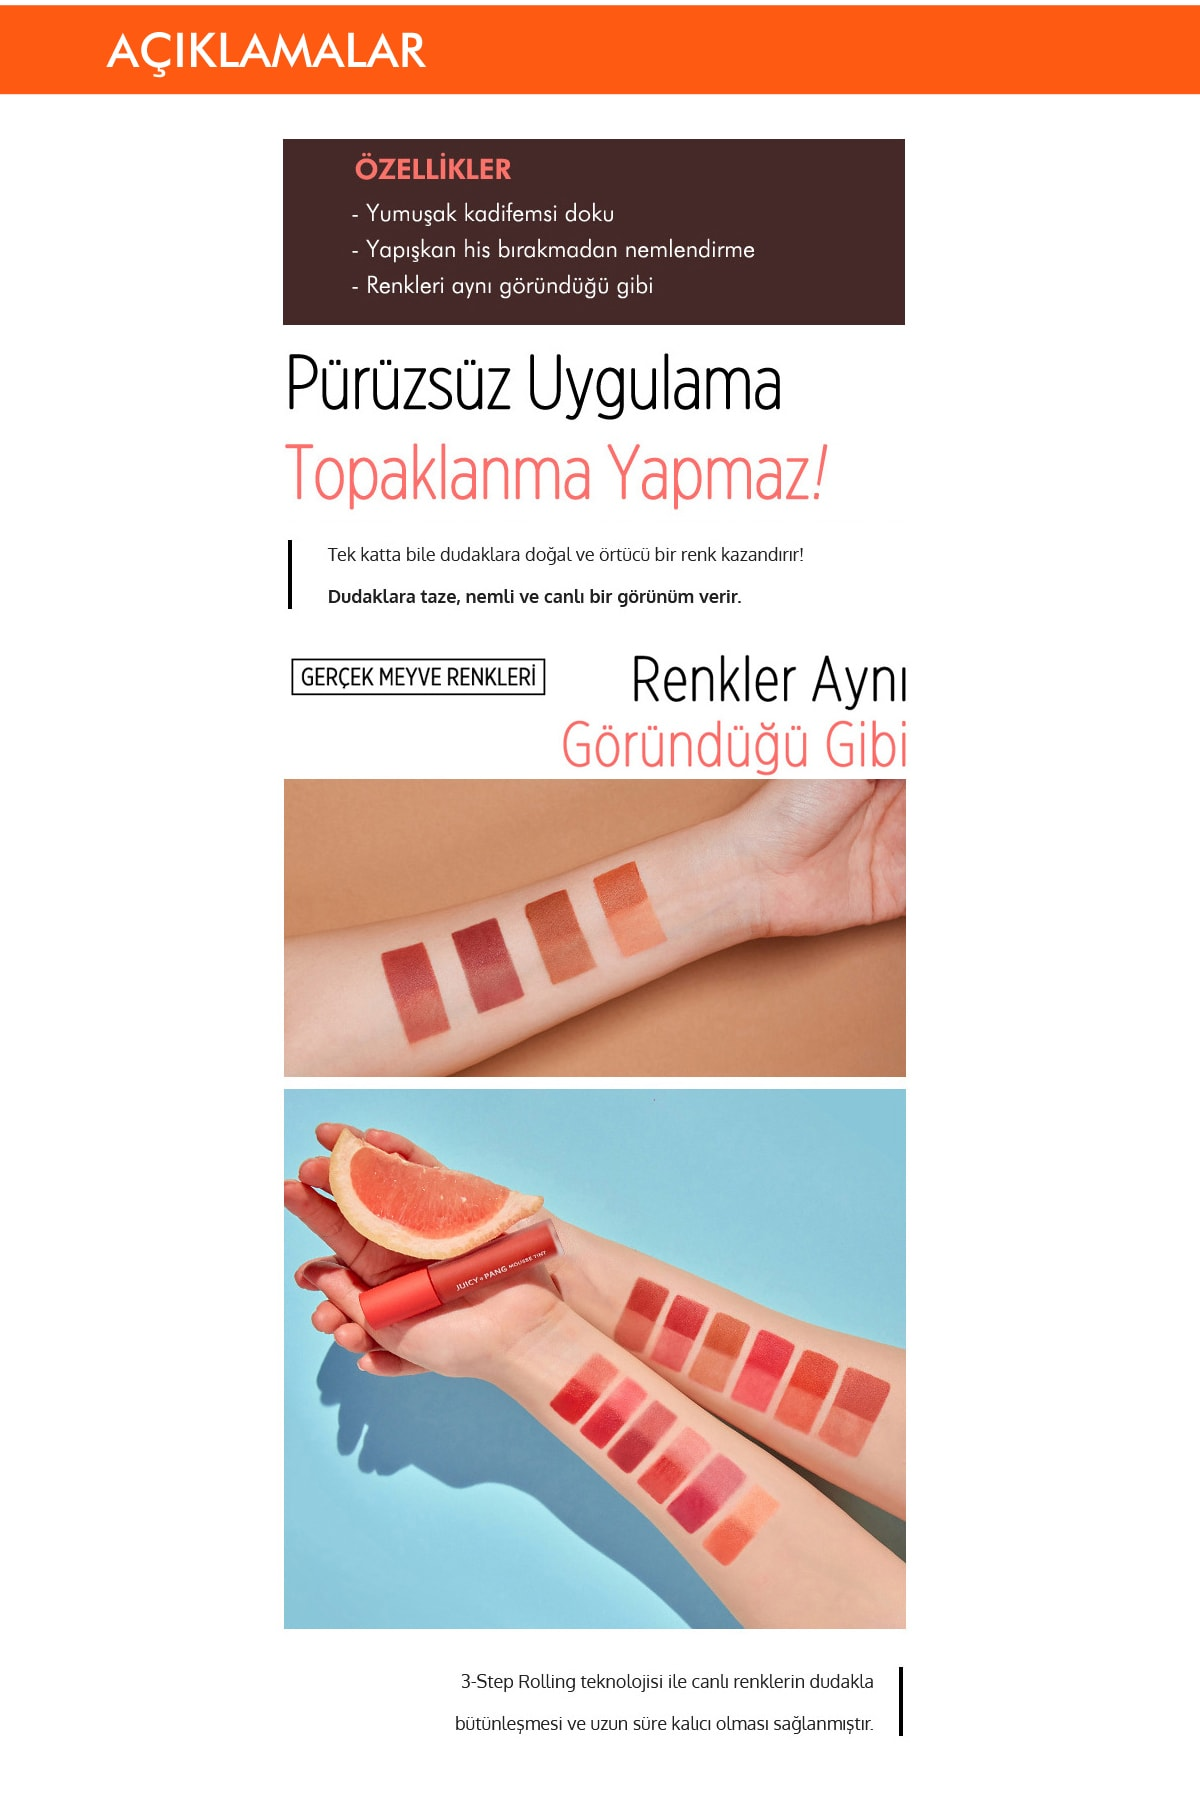 Missha Pürüzsüz Görünüm Sunan Kalıcı Köpük Tint Ruj APIEU Juicy Pang Mousse Tint (RD01) 3